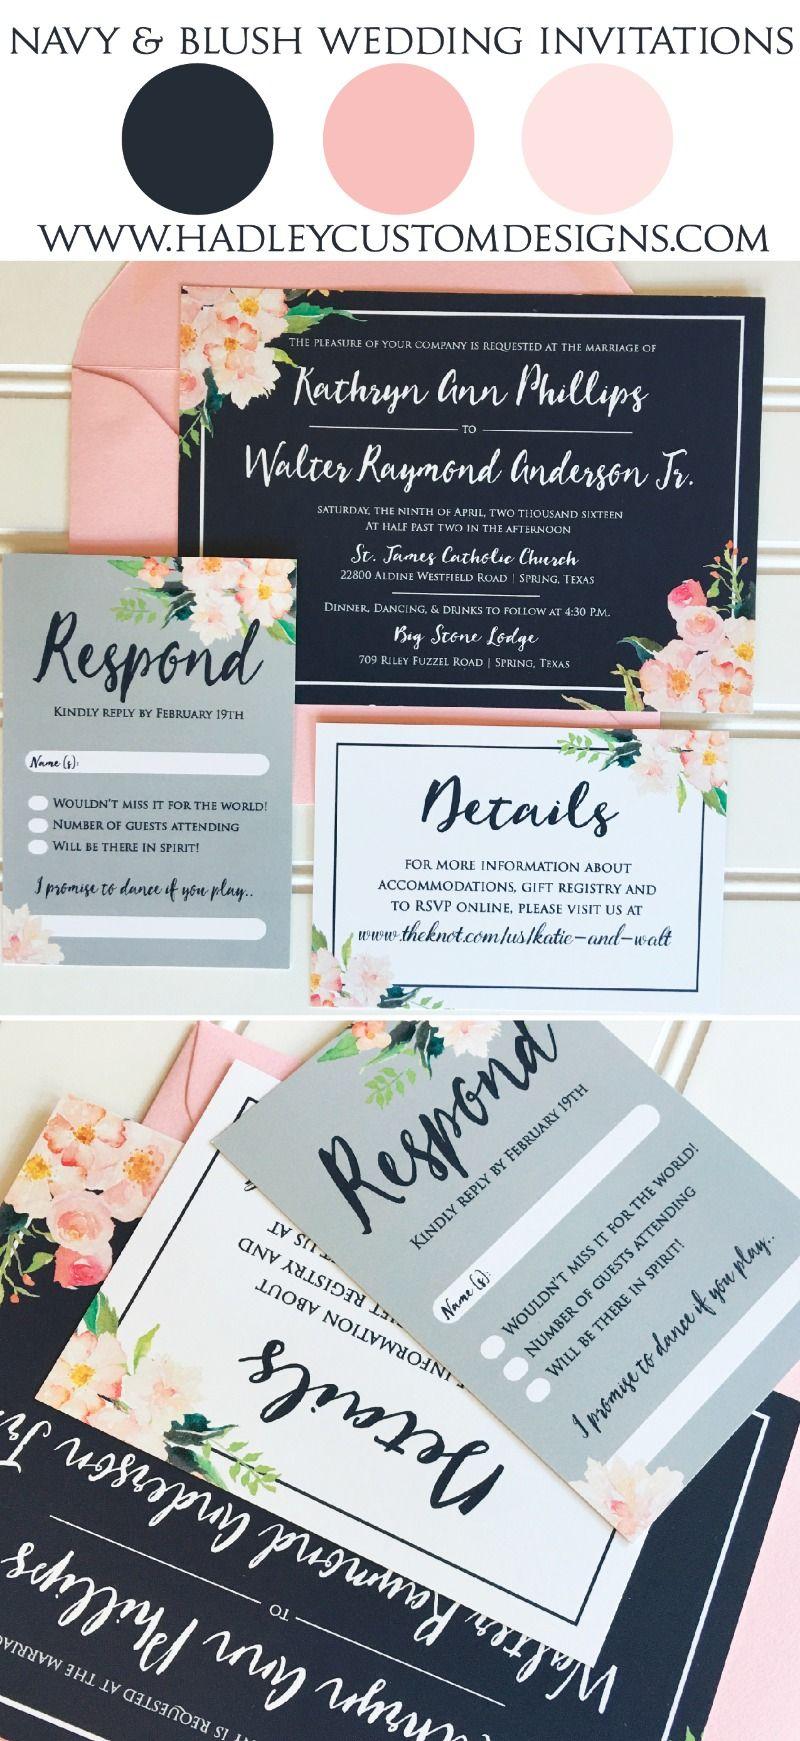 Elegant Wedding Invitations, Classic Wedding Invitations, Formal Wedding Invitations, Traditional Wedding Invitations, Unique Wedding Invitations, Custom Wedding Invitation, Vintage Wedding Invites